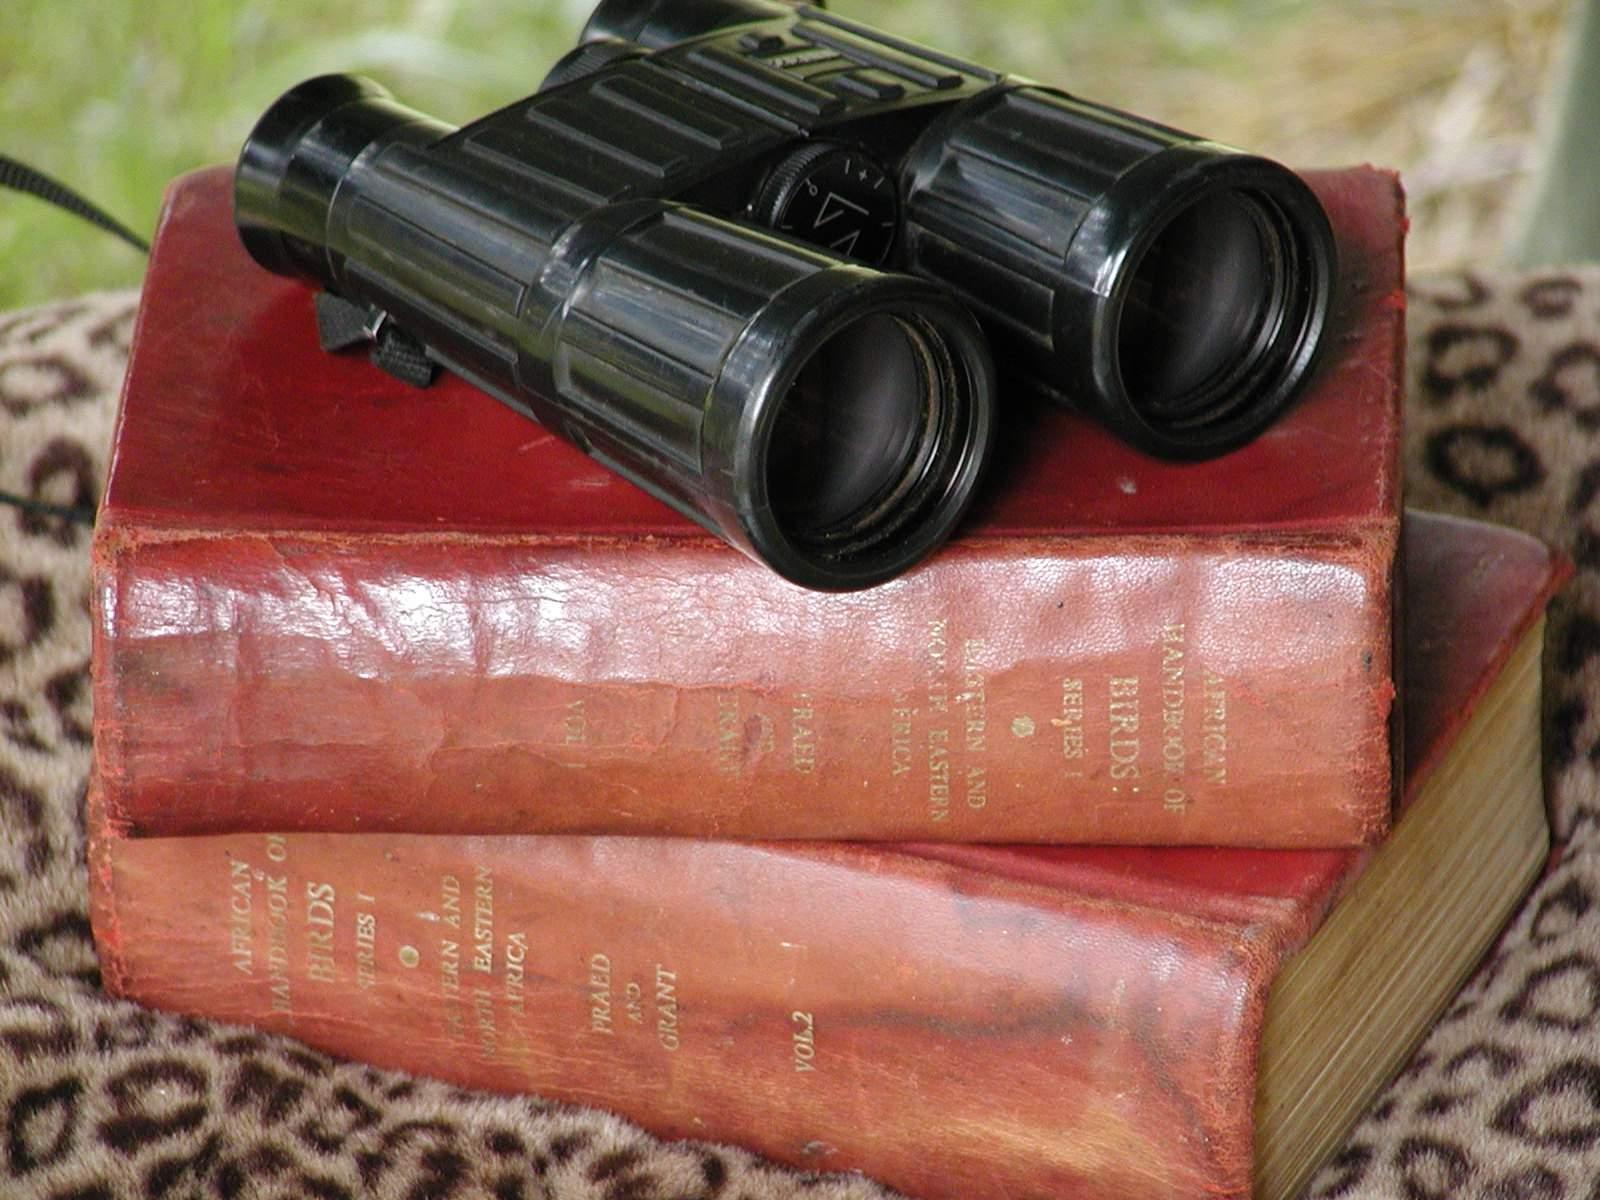 Old Africa Books & Binos